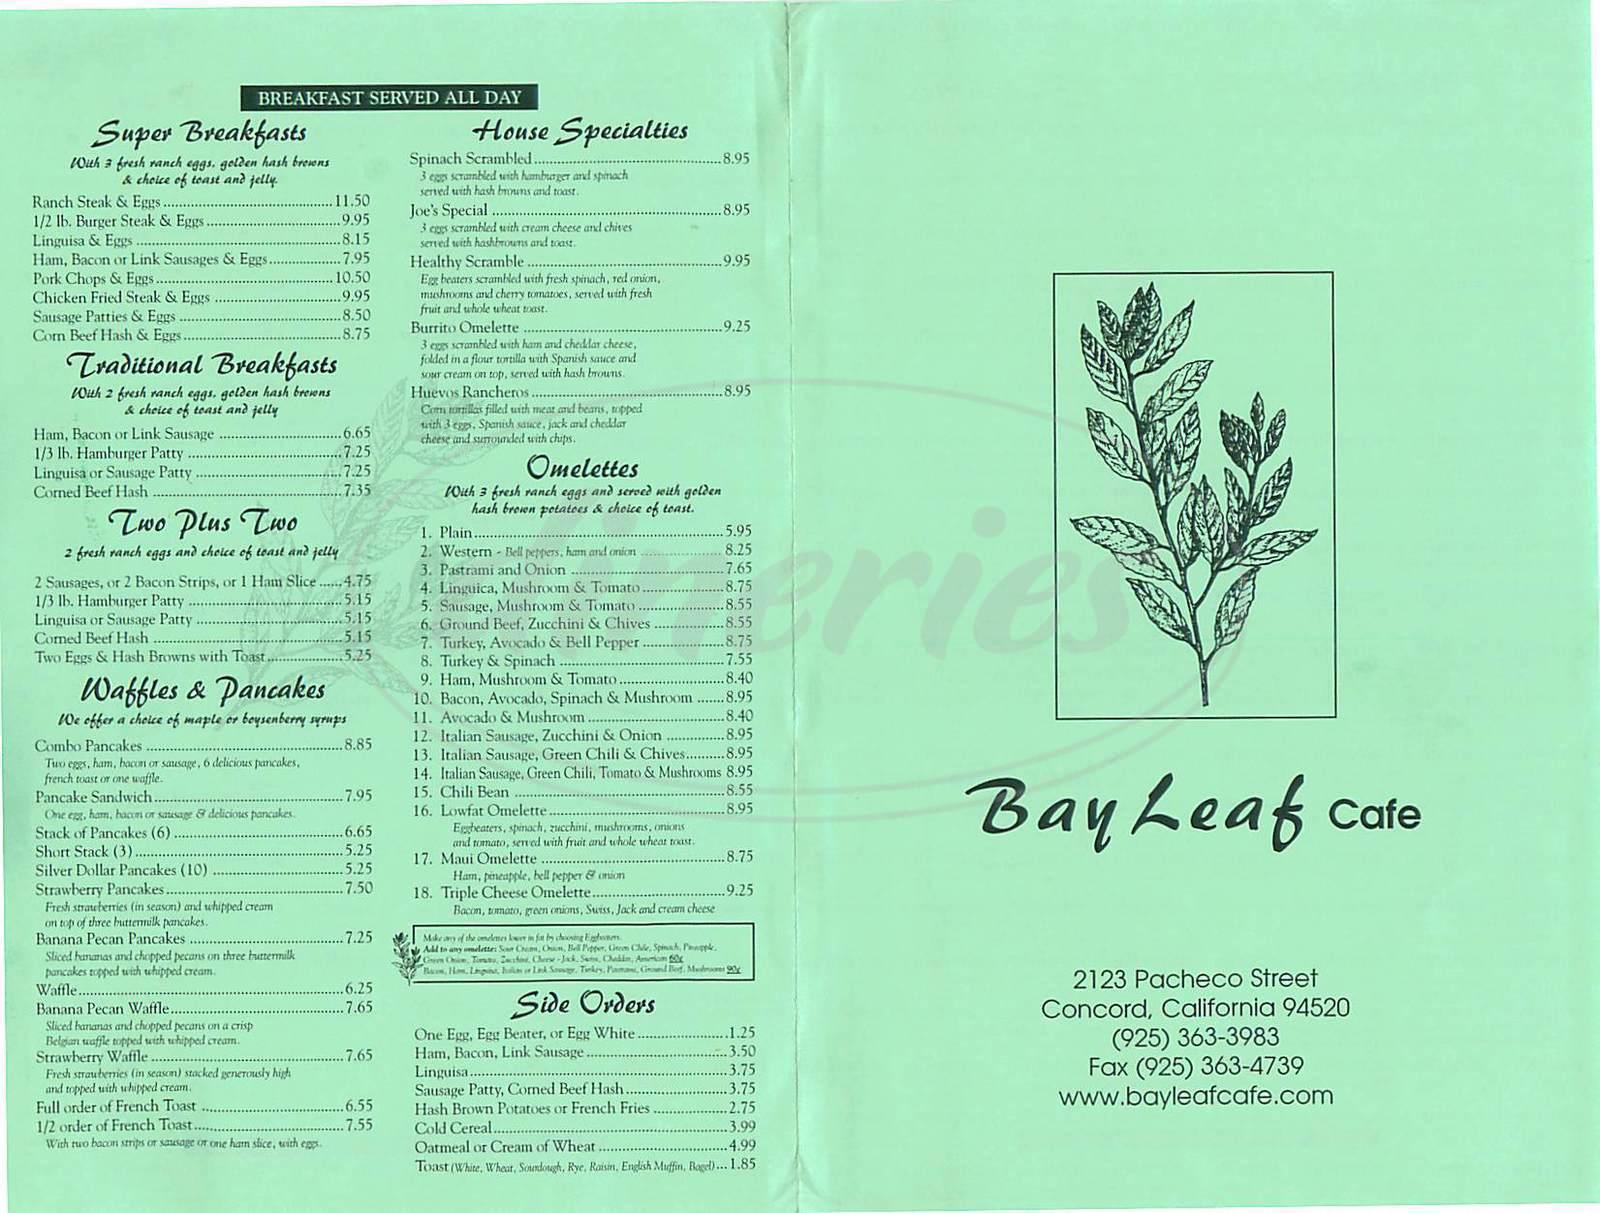 menu for Bay Leaf Café